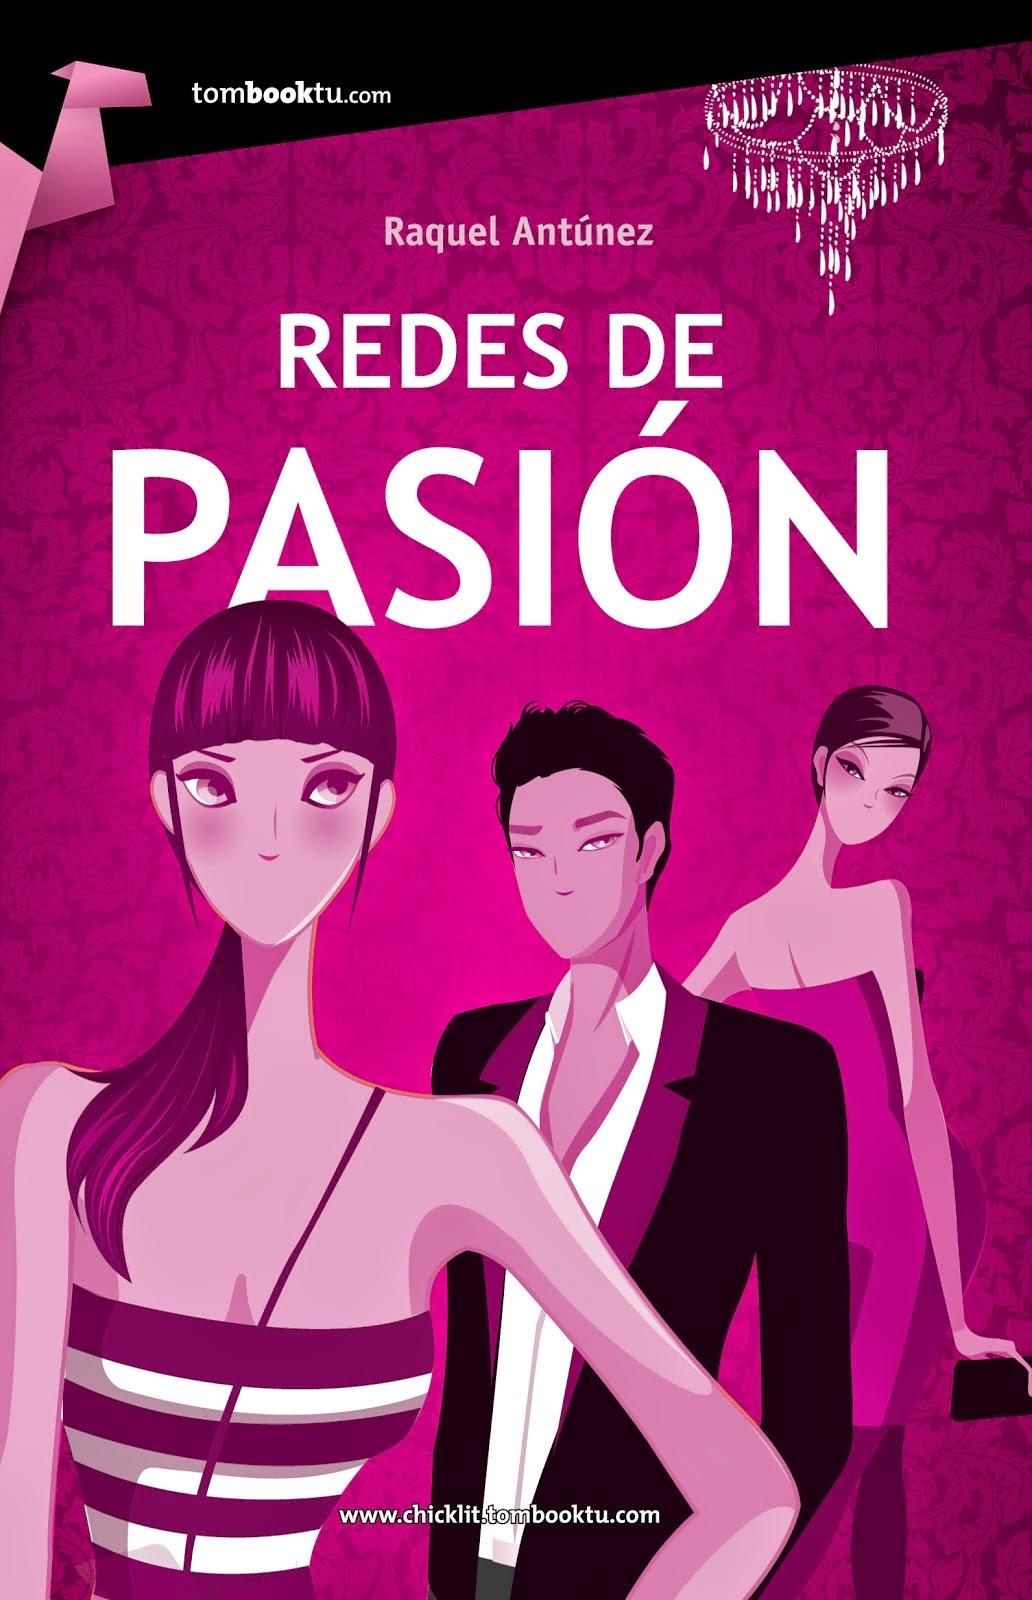 http://yerathelbooks.blogspot.com.es/2014/12/resena-libro-40-redes-de-pasion-raquel.html